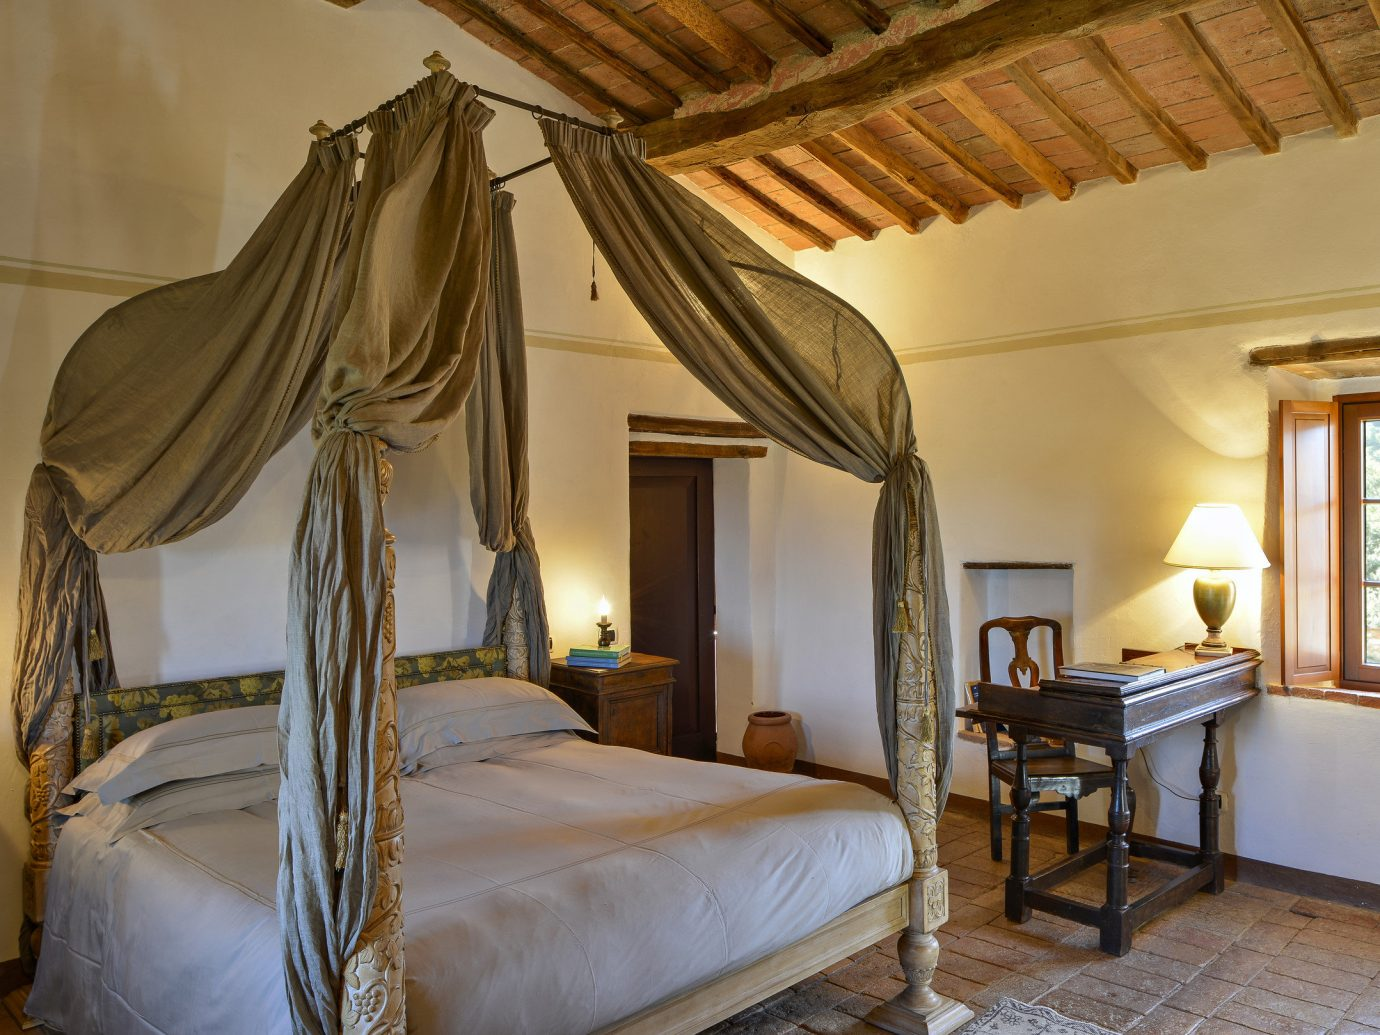 Hotels Luxury Travel indoor wall bed floor room Bedroom estate Suite ceiling real estate furniture interior design